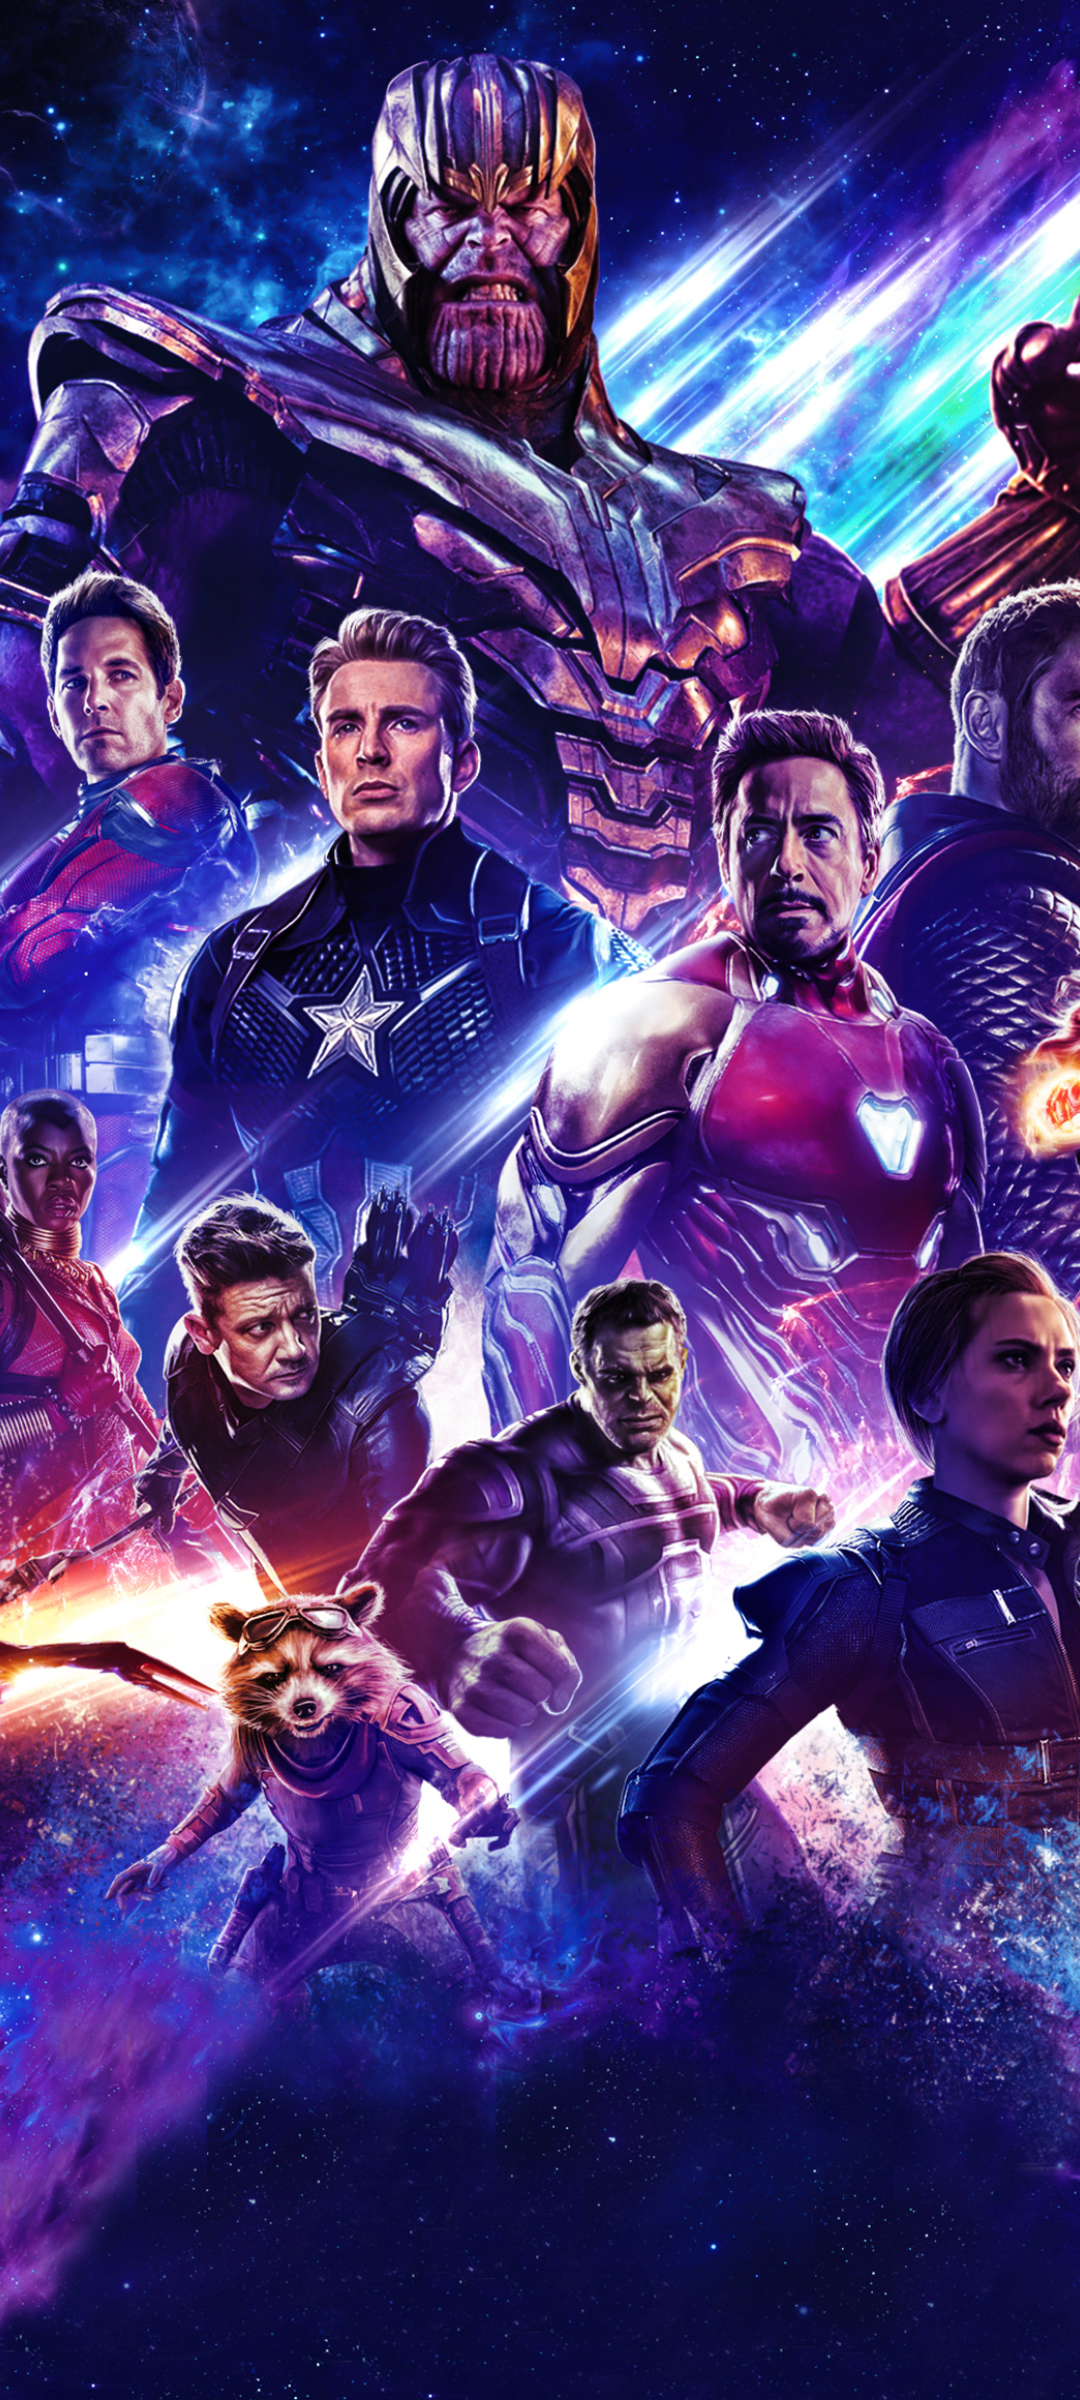 1080x2400 Avengers Endgame 2019 Movie 1080x2400 Resolution ...